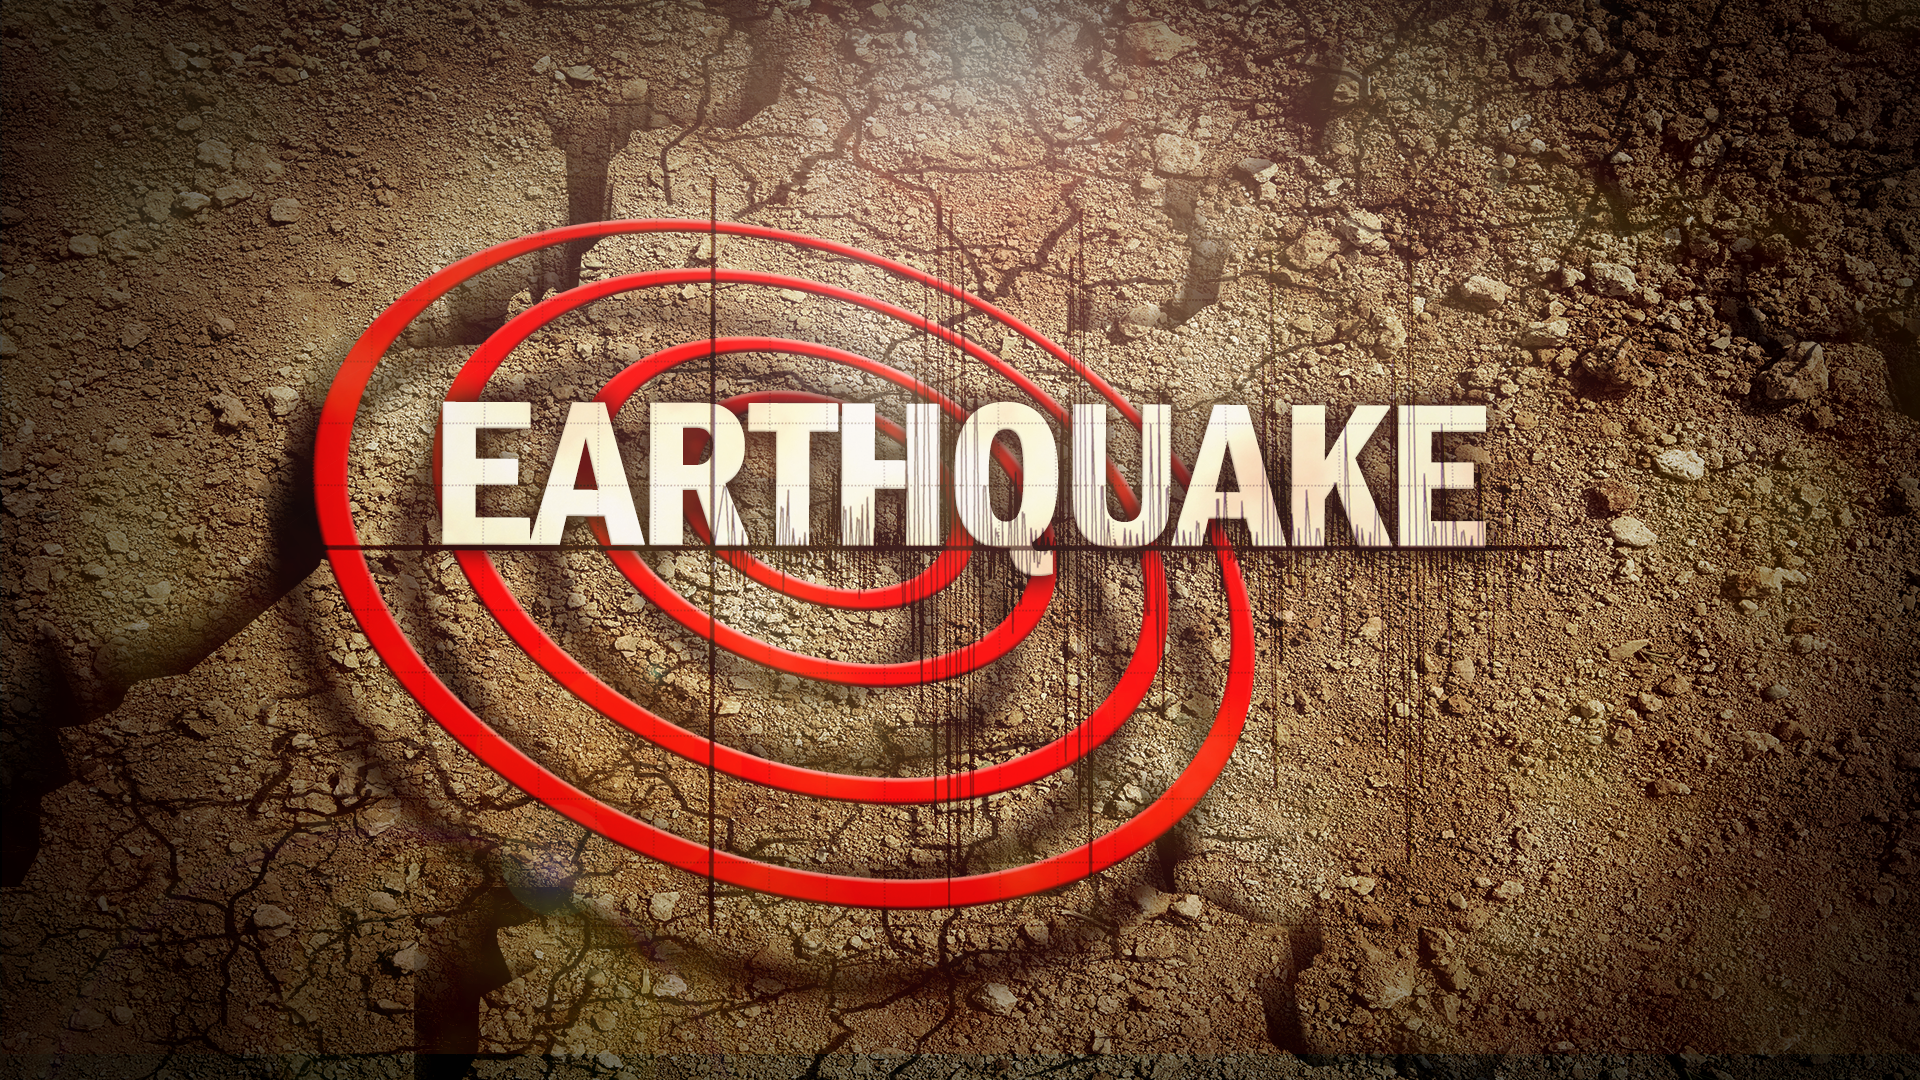 Earthquake v2 NOT MGN_185513